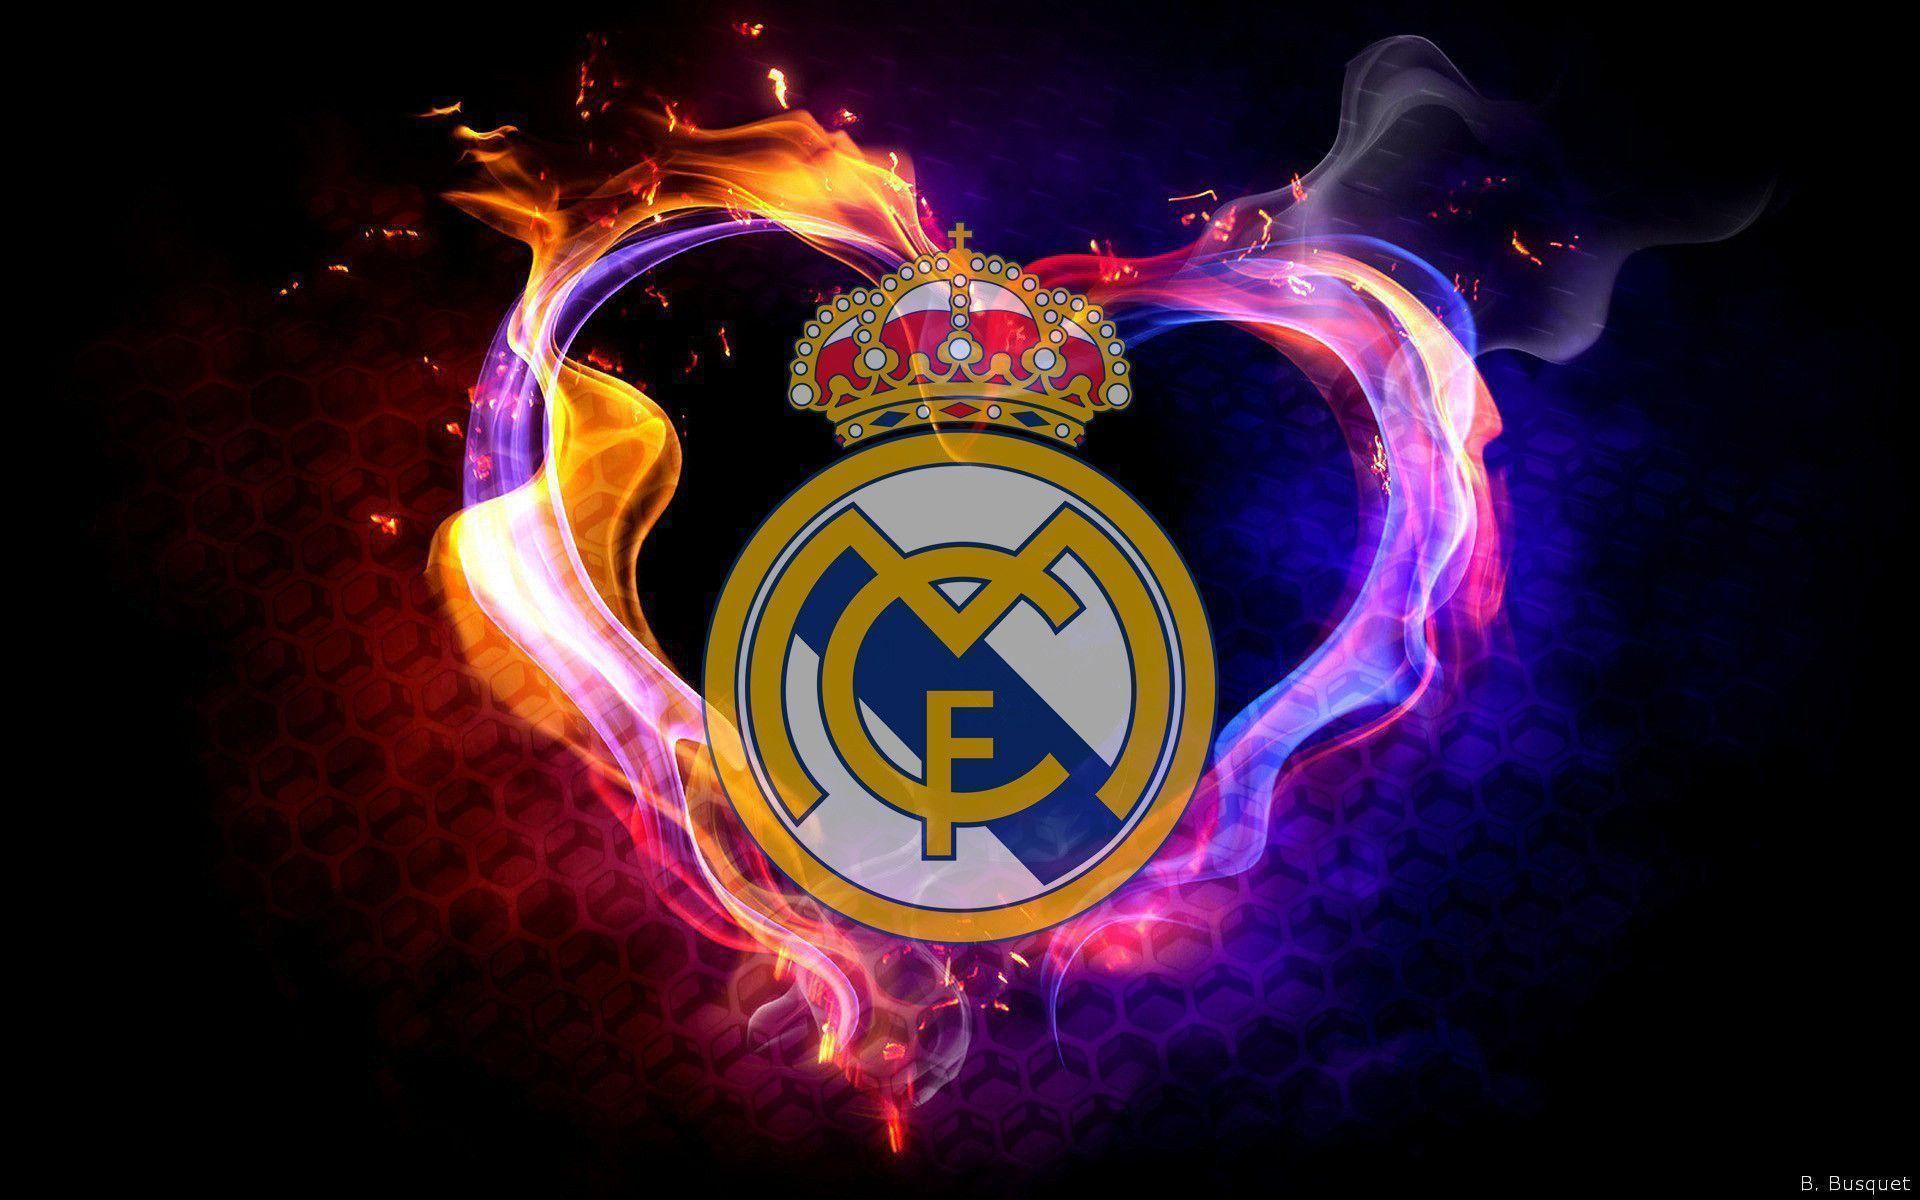 Bekannt Real Madrid Logo Wallpapers HD 2016 - Wallpaper Cave FZ03